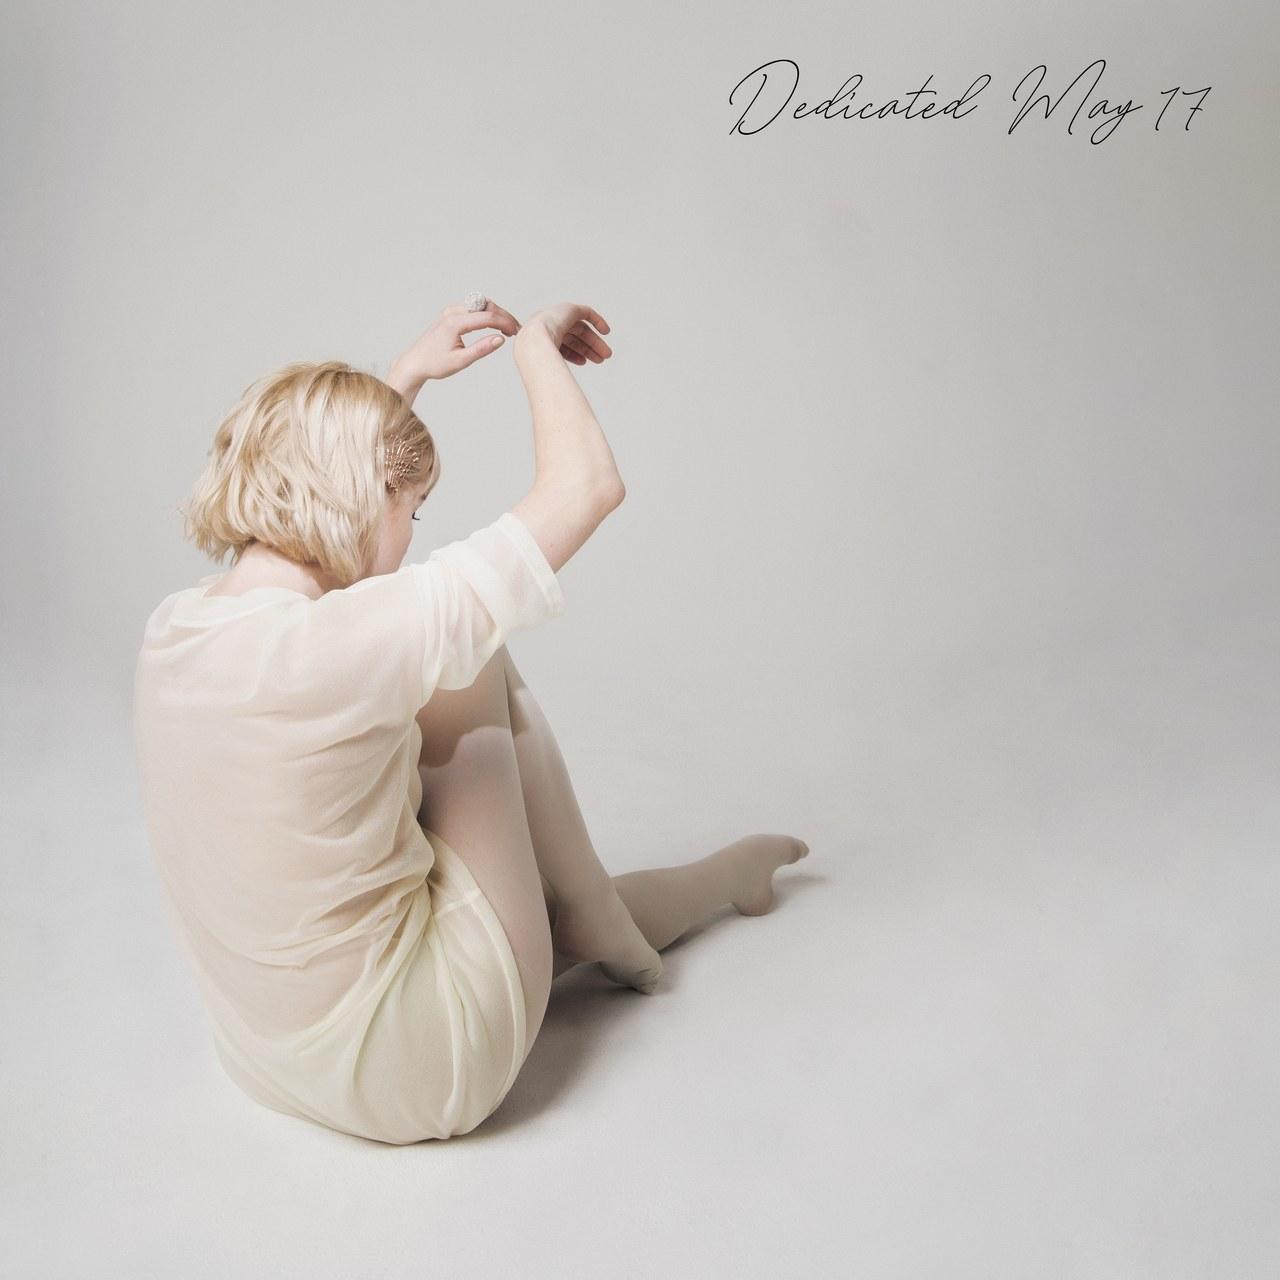 Carly-Rae-Jepsen dedicated new album cover artwork